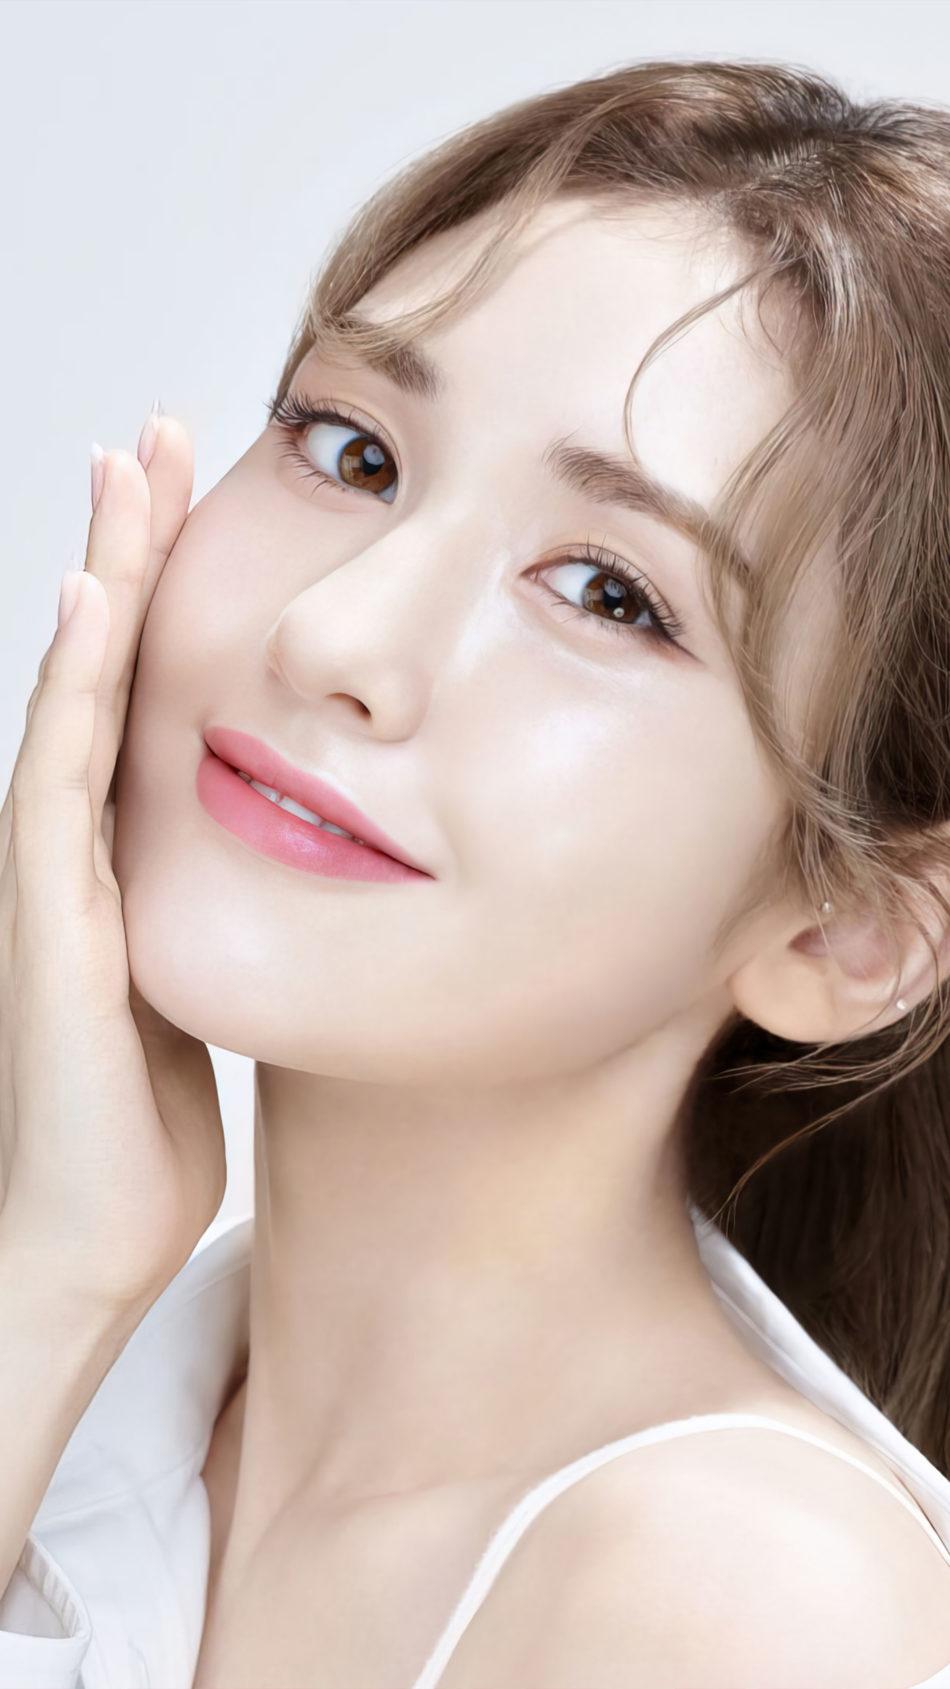 Beautiful Jeon Somi 2021 4K Ultra HD Mobile Wallpaper